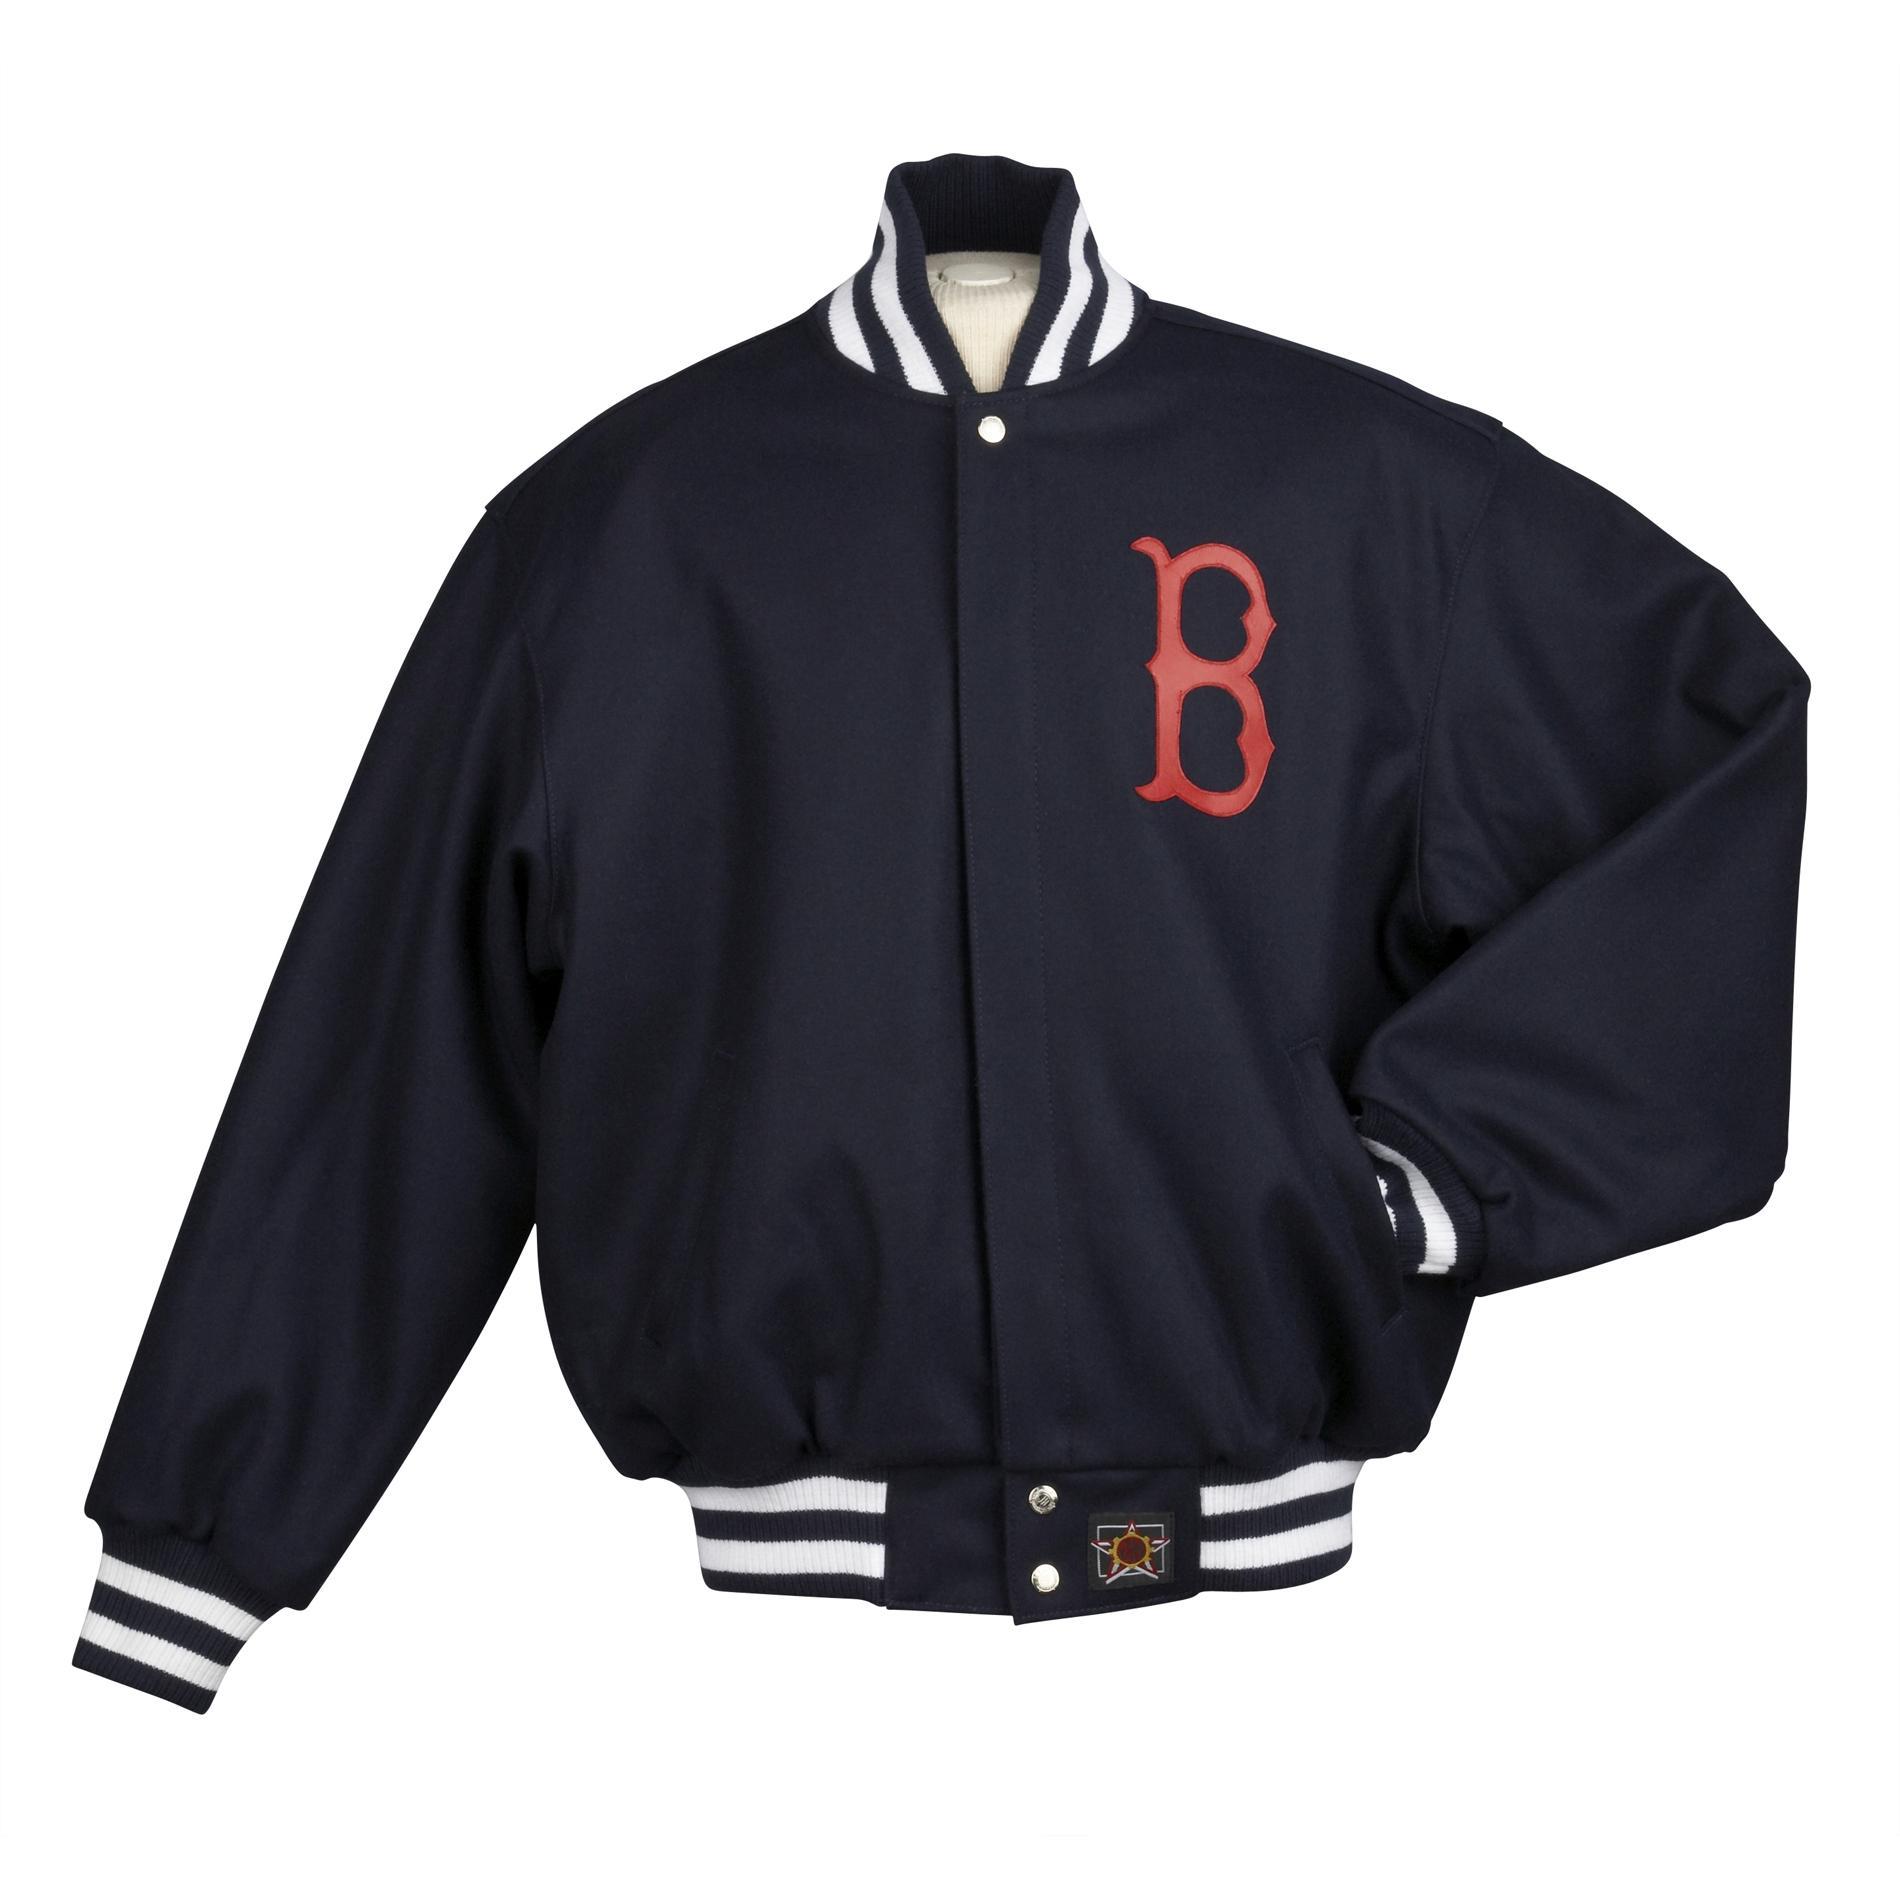 JH Designs Men's Boston Red Sox Domestic Wool Jacket - Thumbnail 2